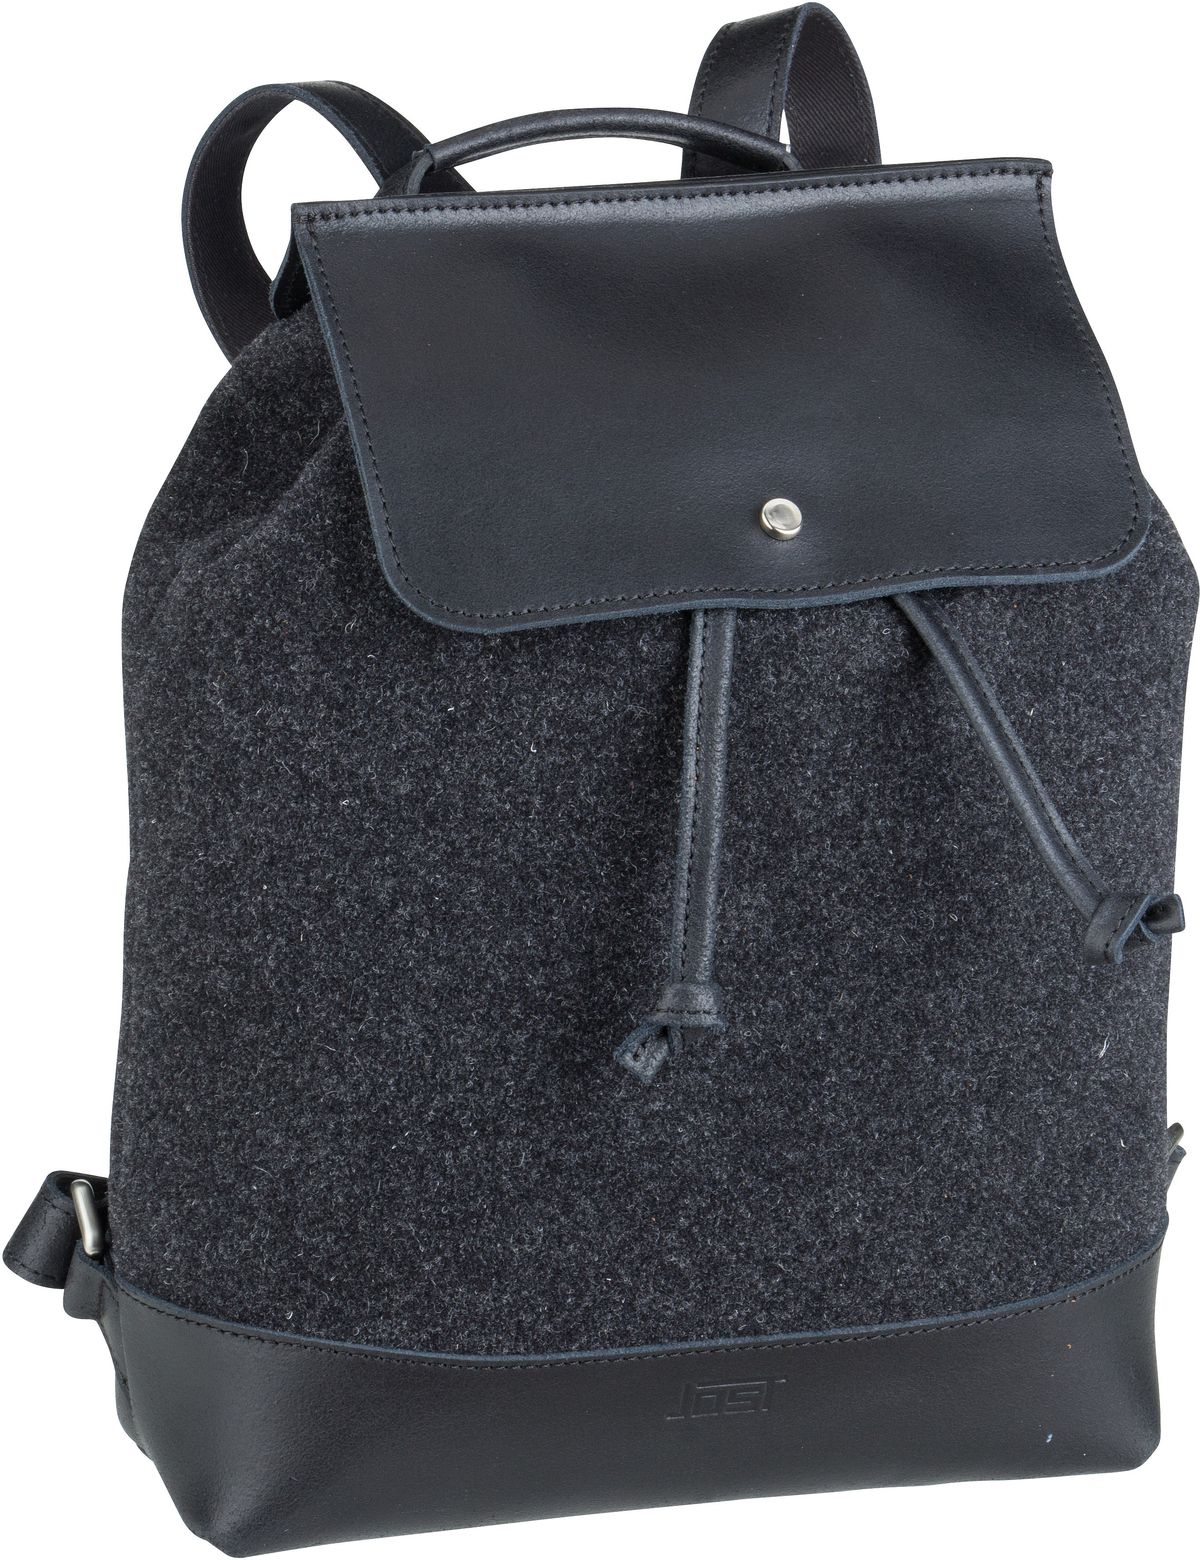 Jost Rucksack / Daypack Farum 3028 Beutel Rucksack Black